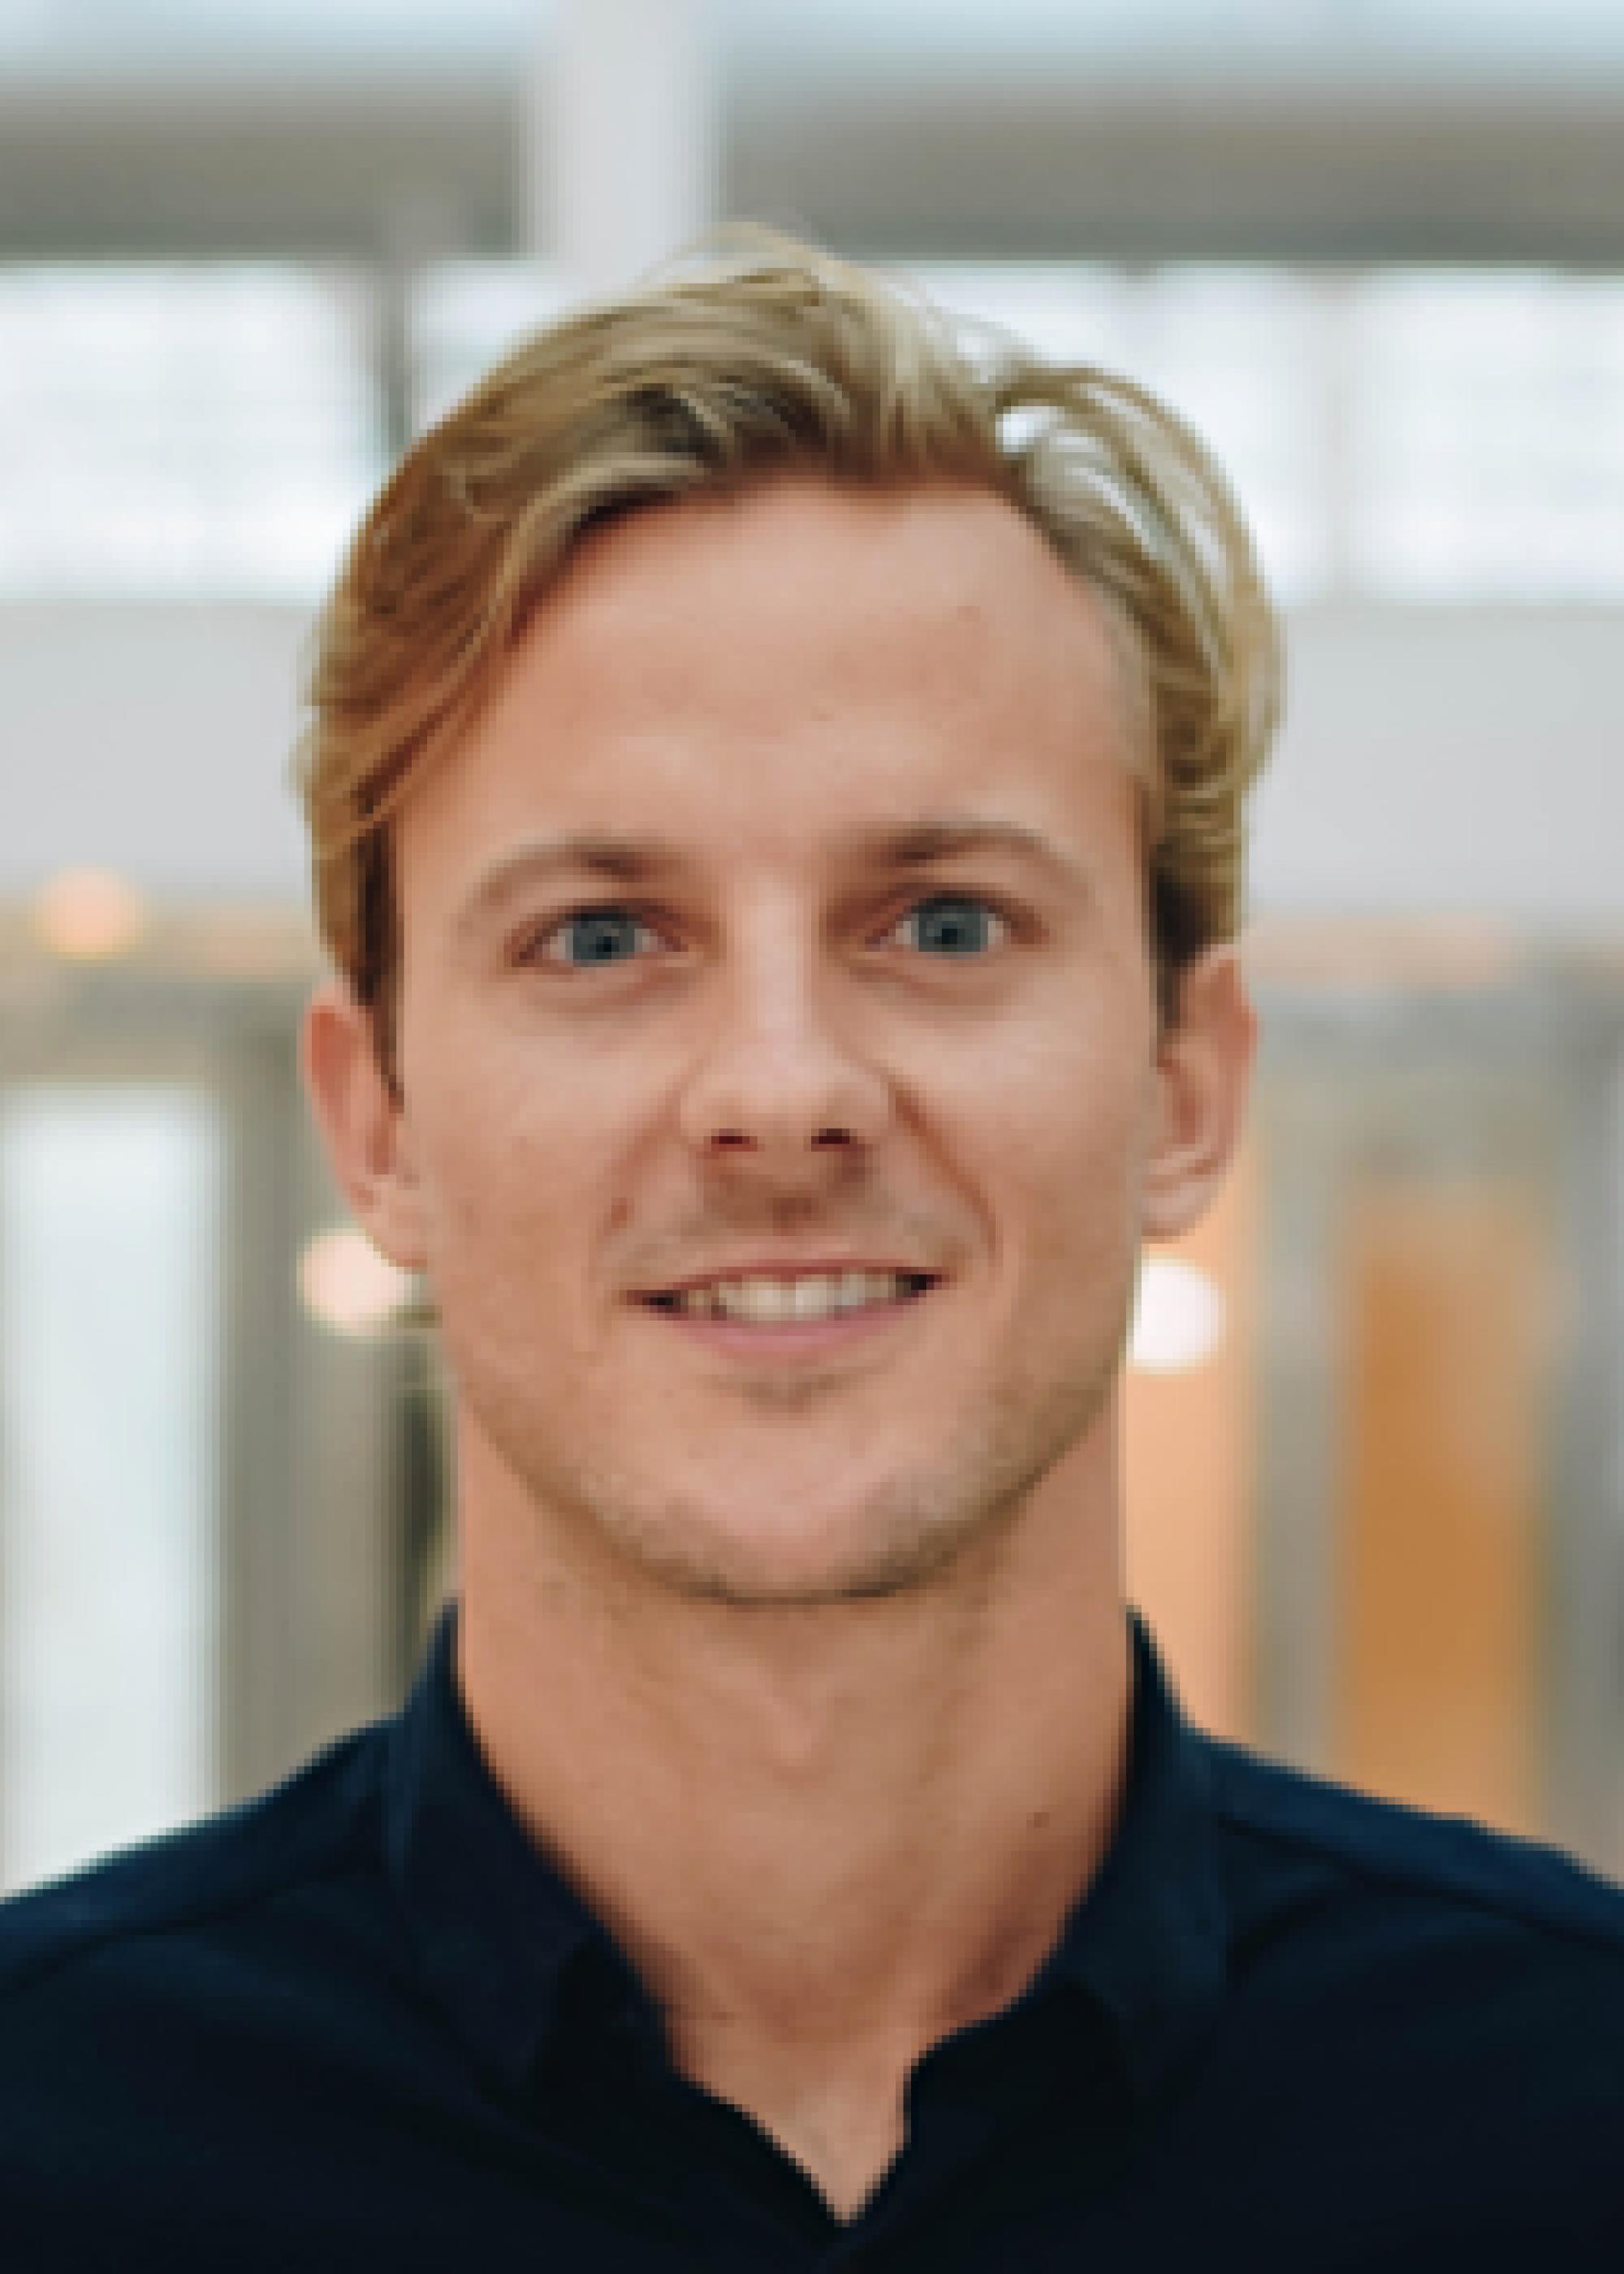 Isac-Gustafsson